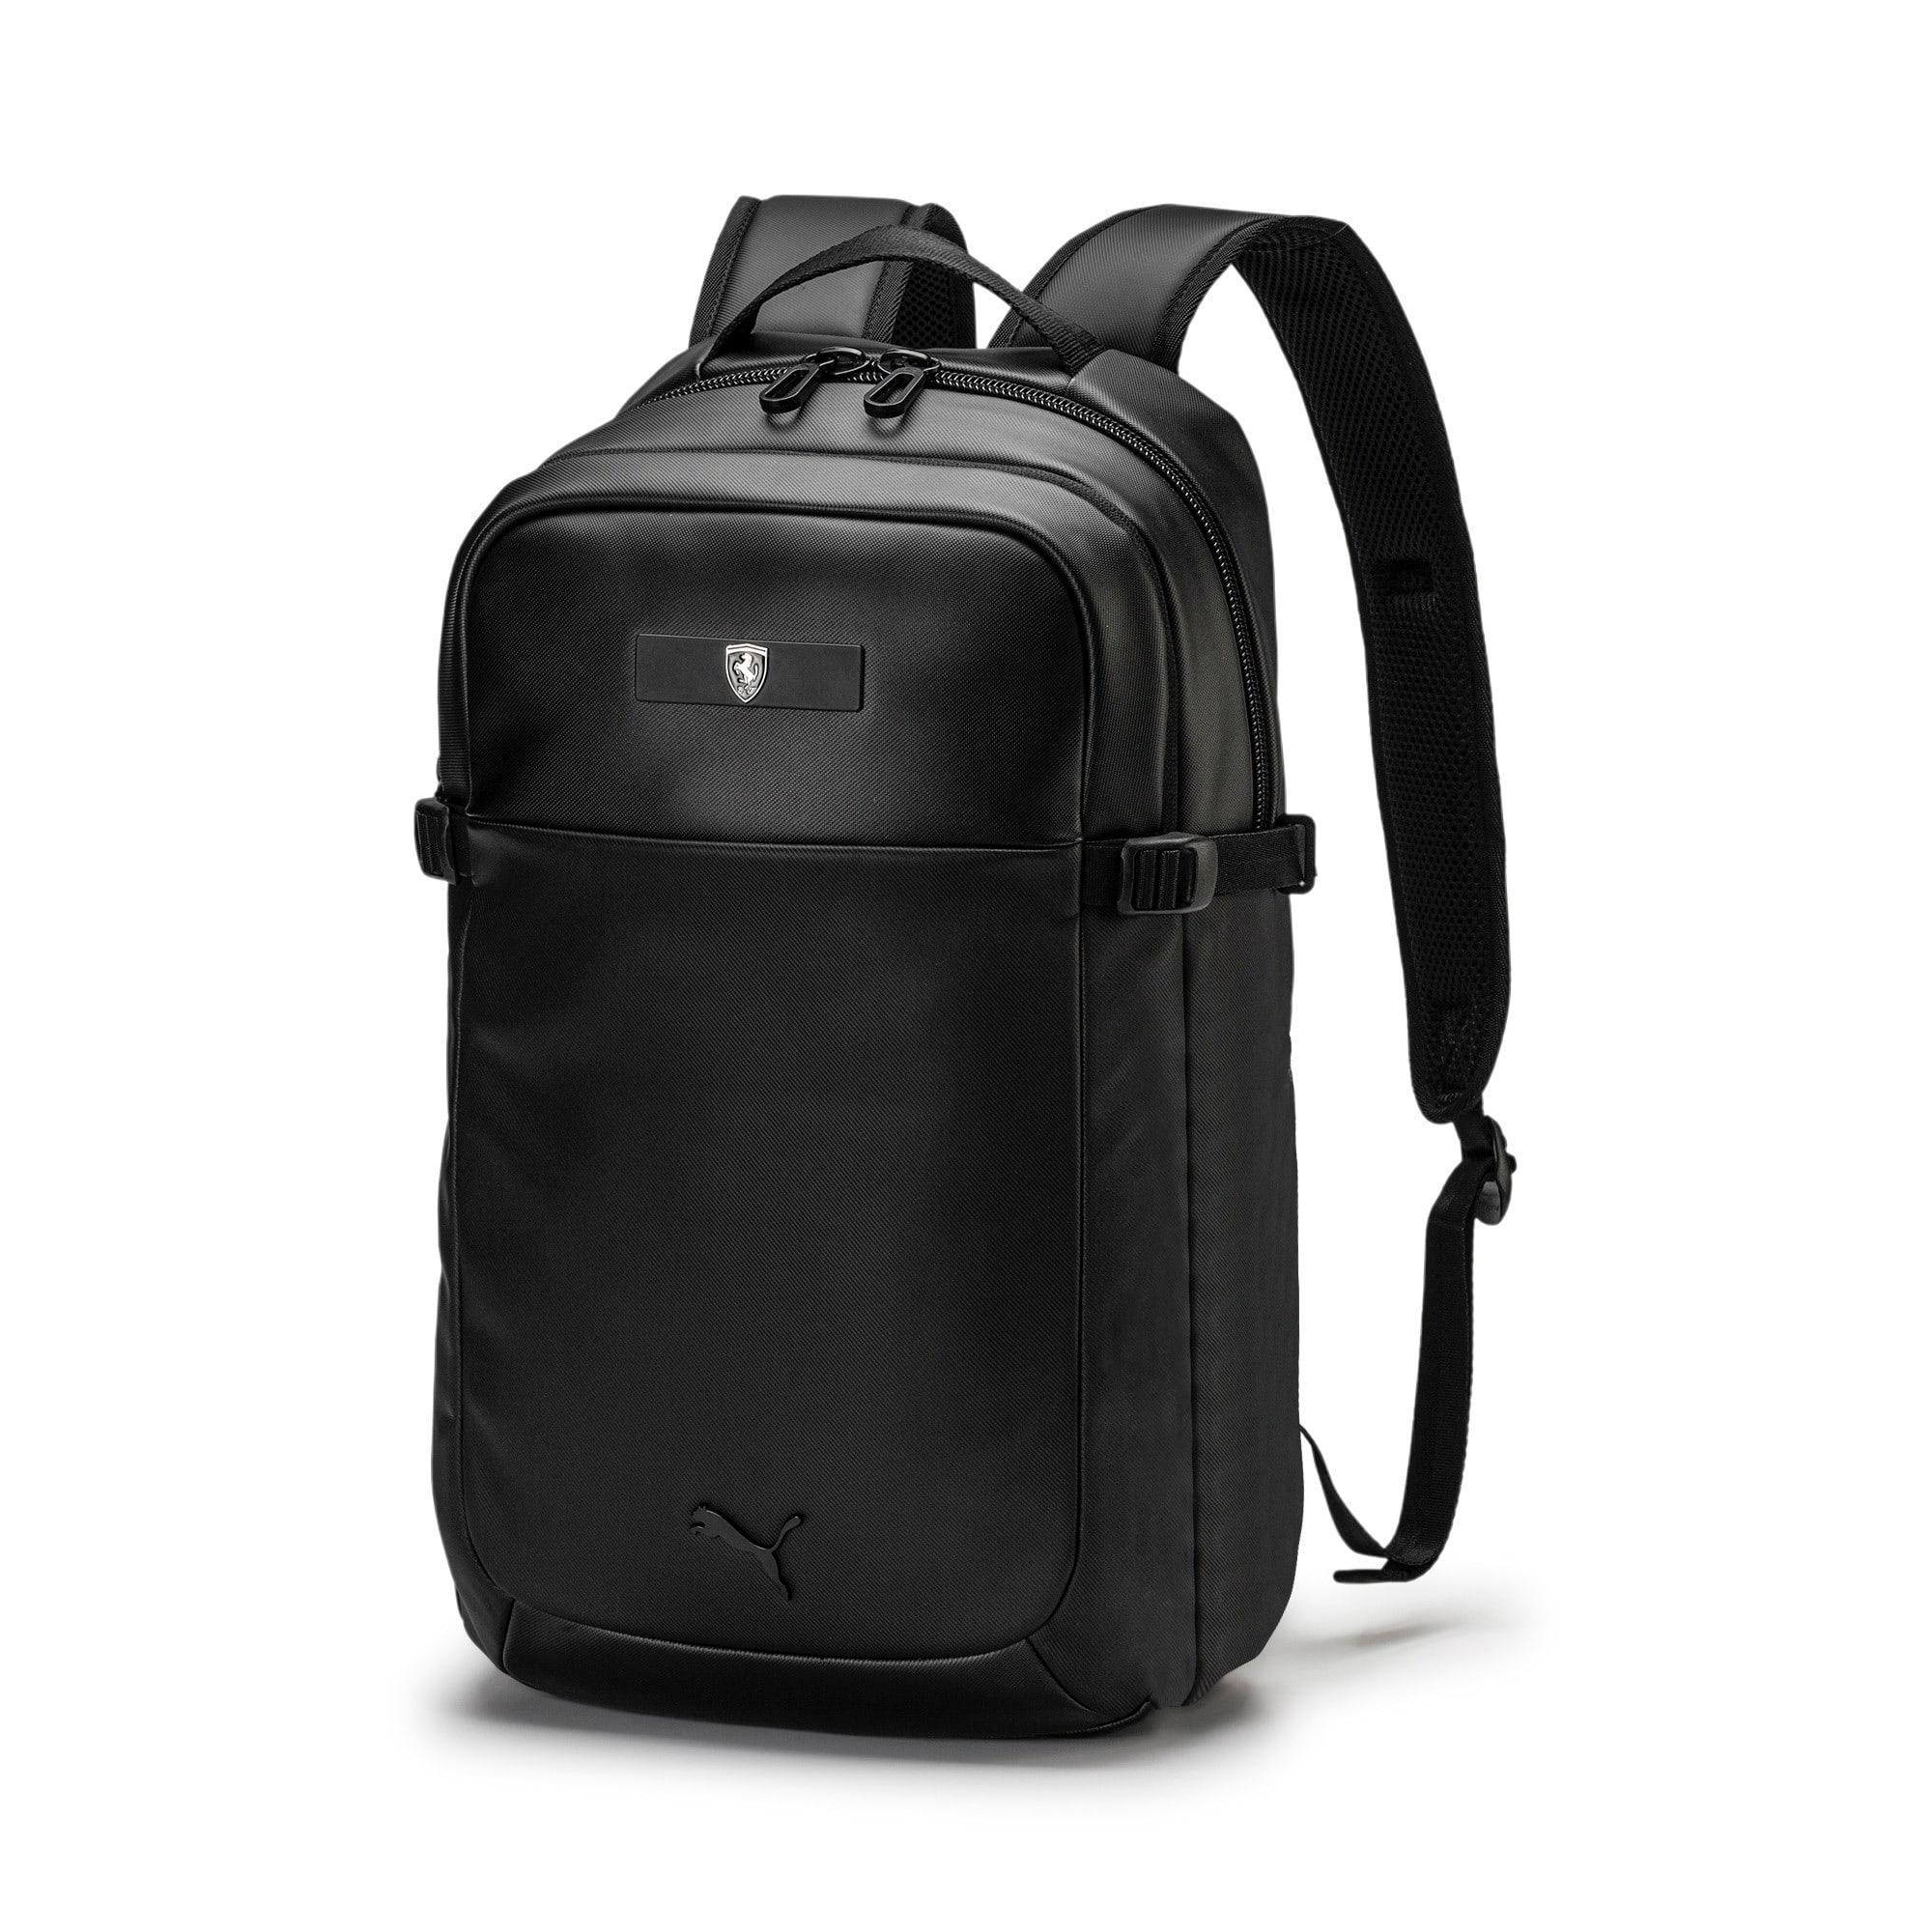 Thumbnail 1 of Scuderia Ferrari Lifestyle Backpack, Puma Black, medium